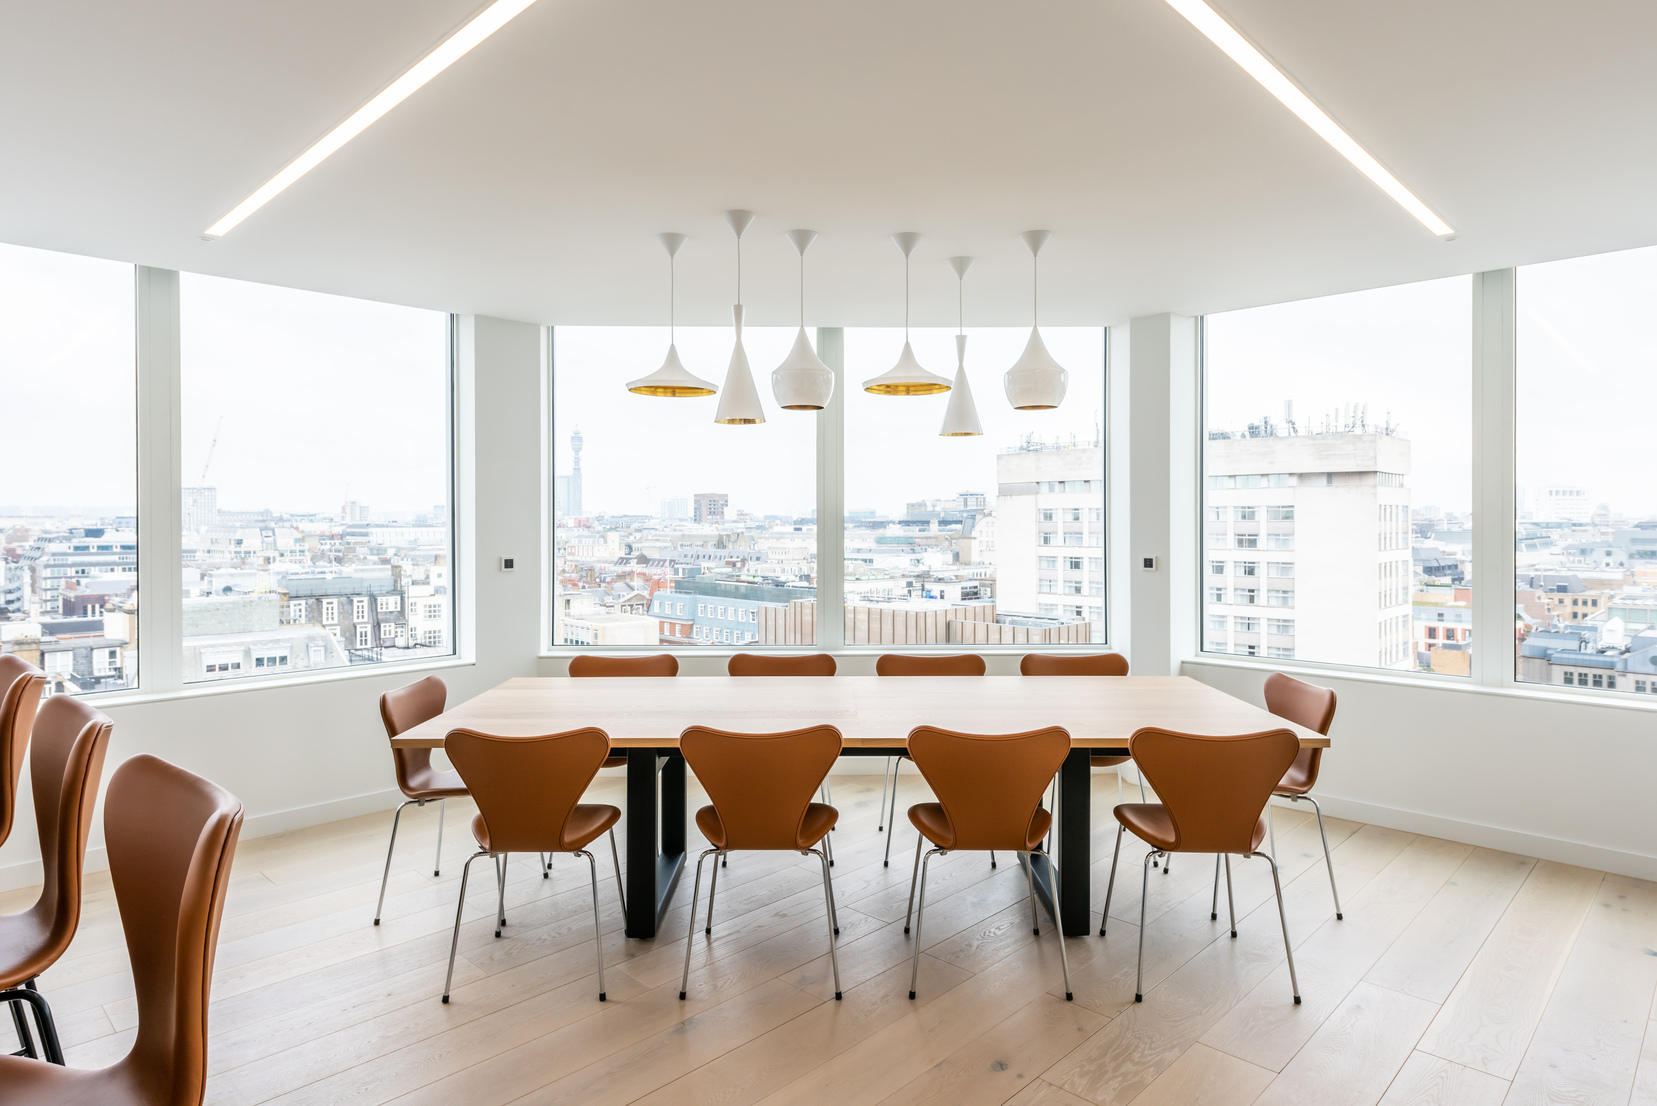 Pelham Capital Meeting Room